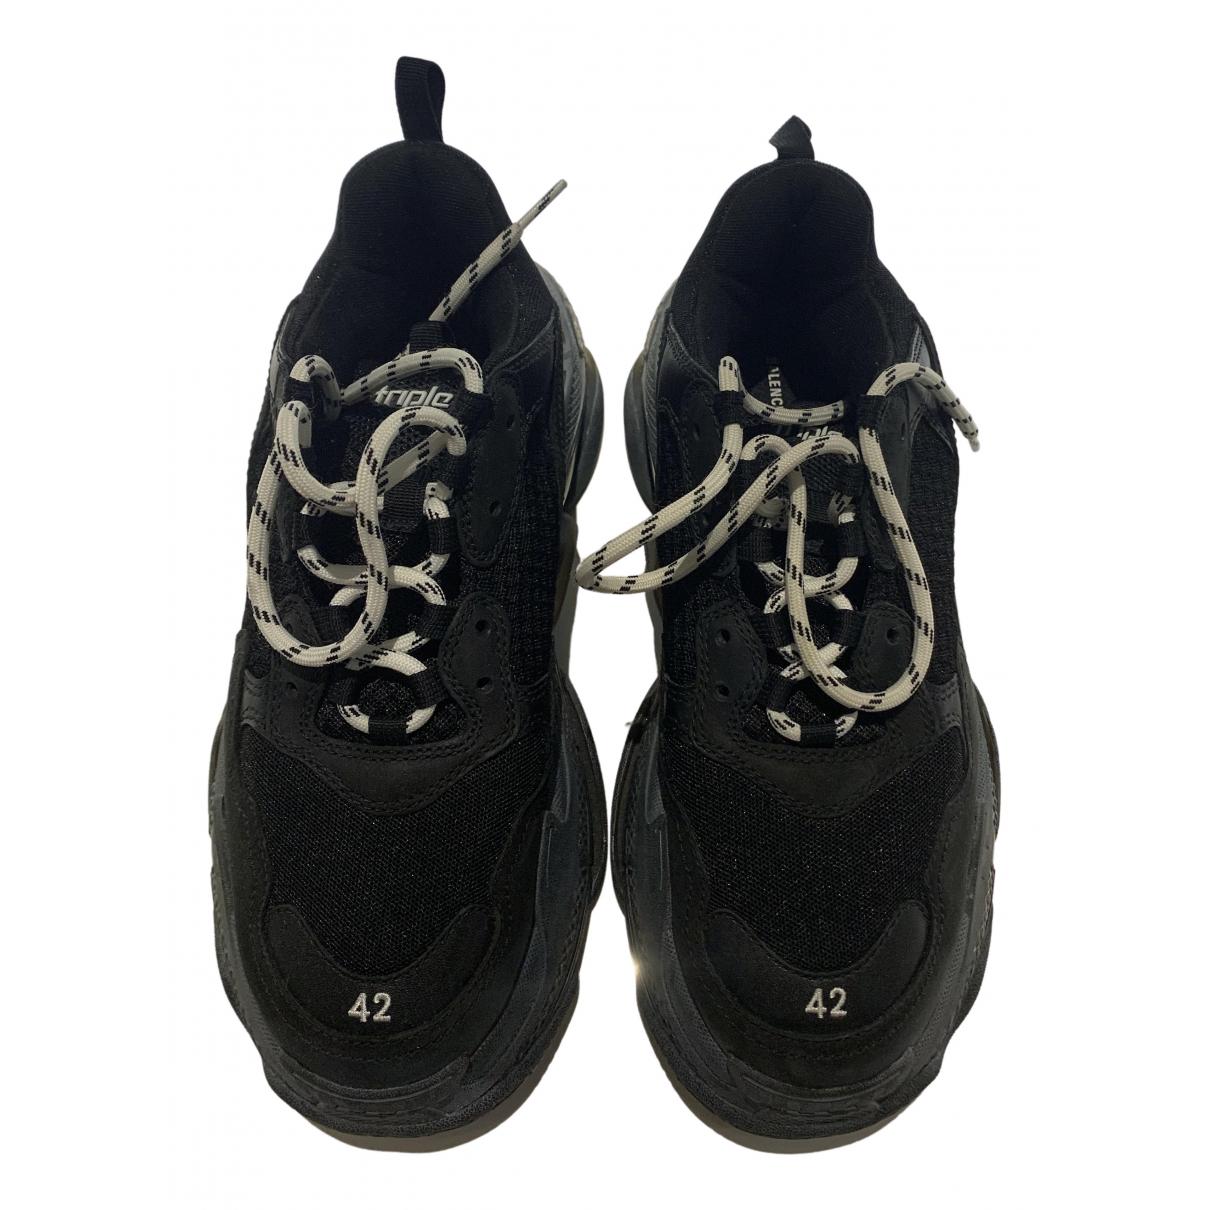 Balenciaga Triple S Black Cloth Trainers for Men 42 EU